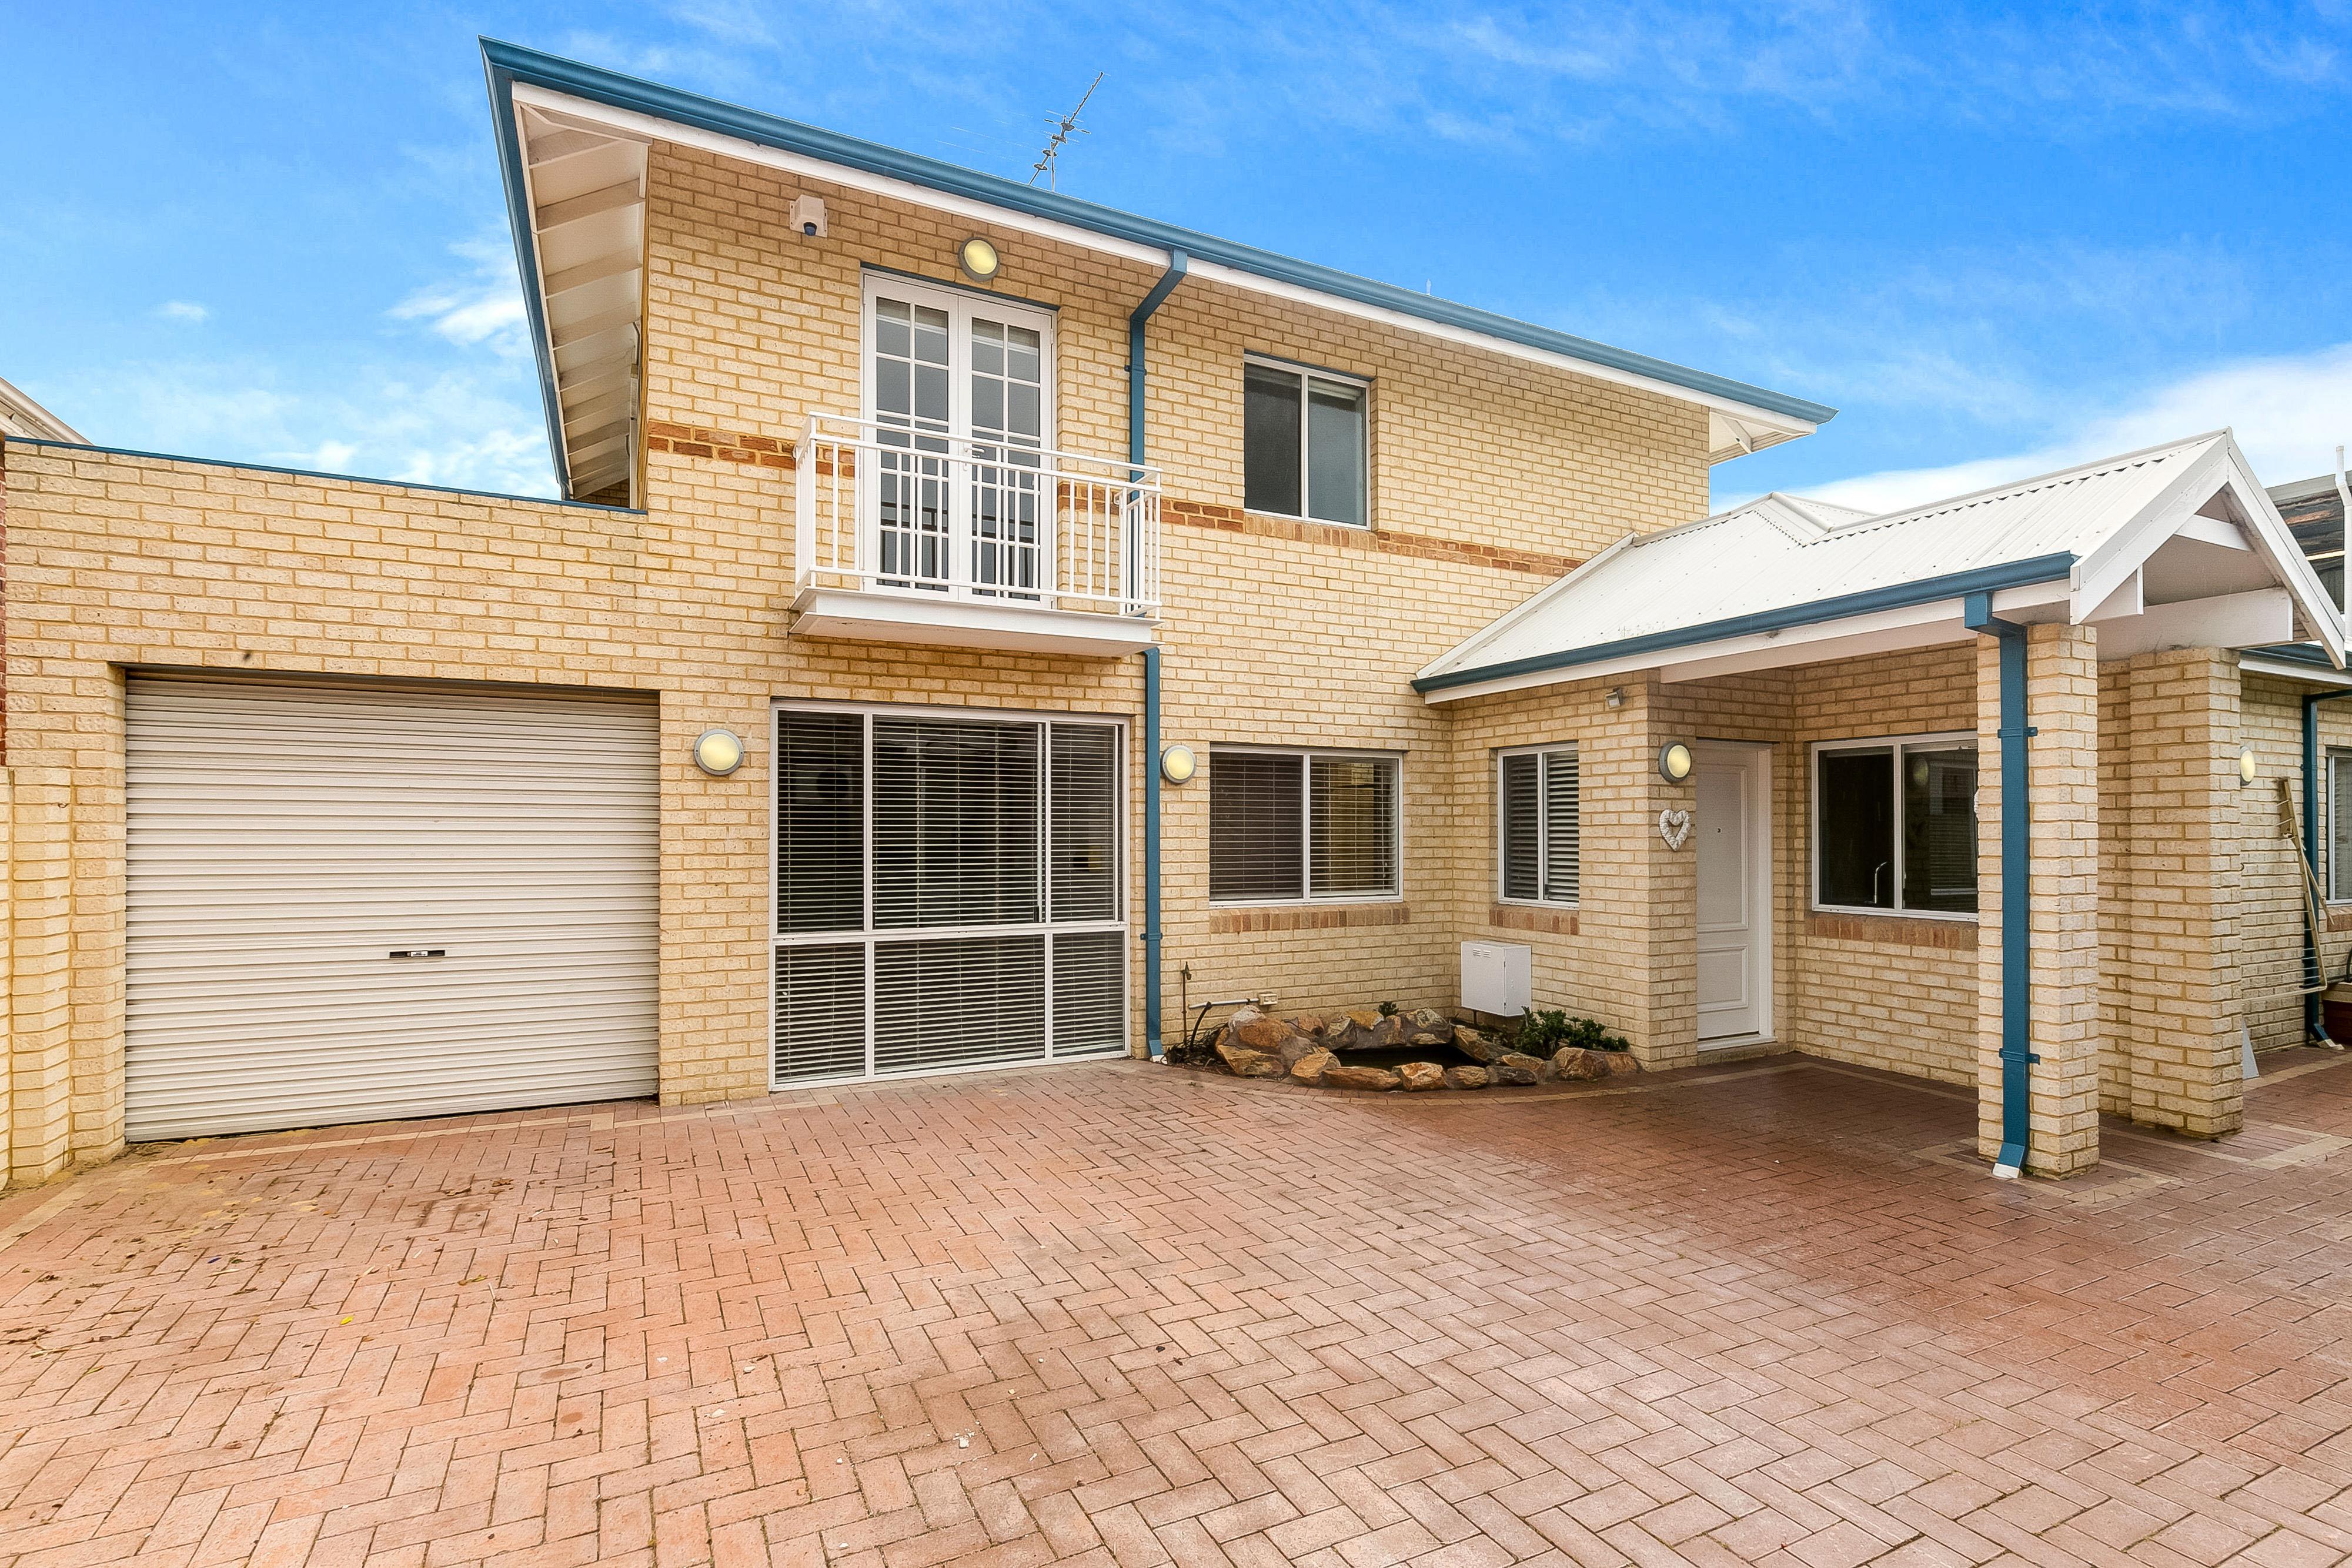 109B Hampton Road South Fremantle - Townhouse For Sale - 23275477 - ACTON Projects